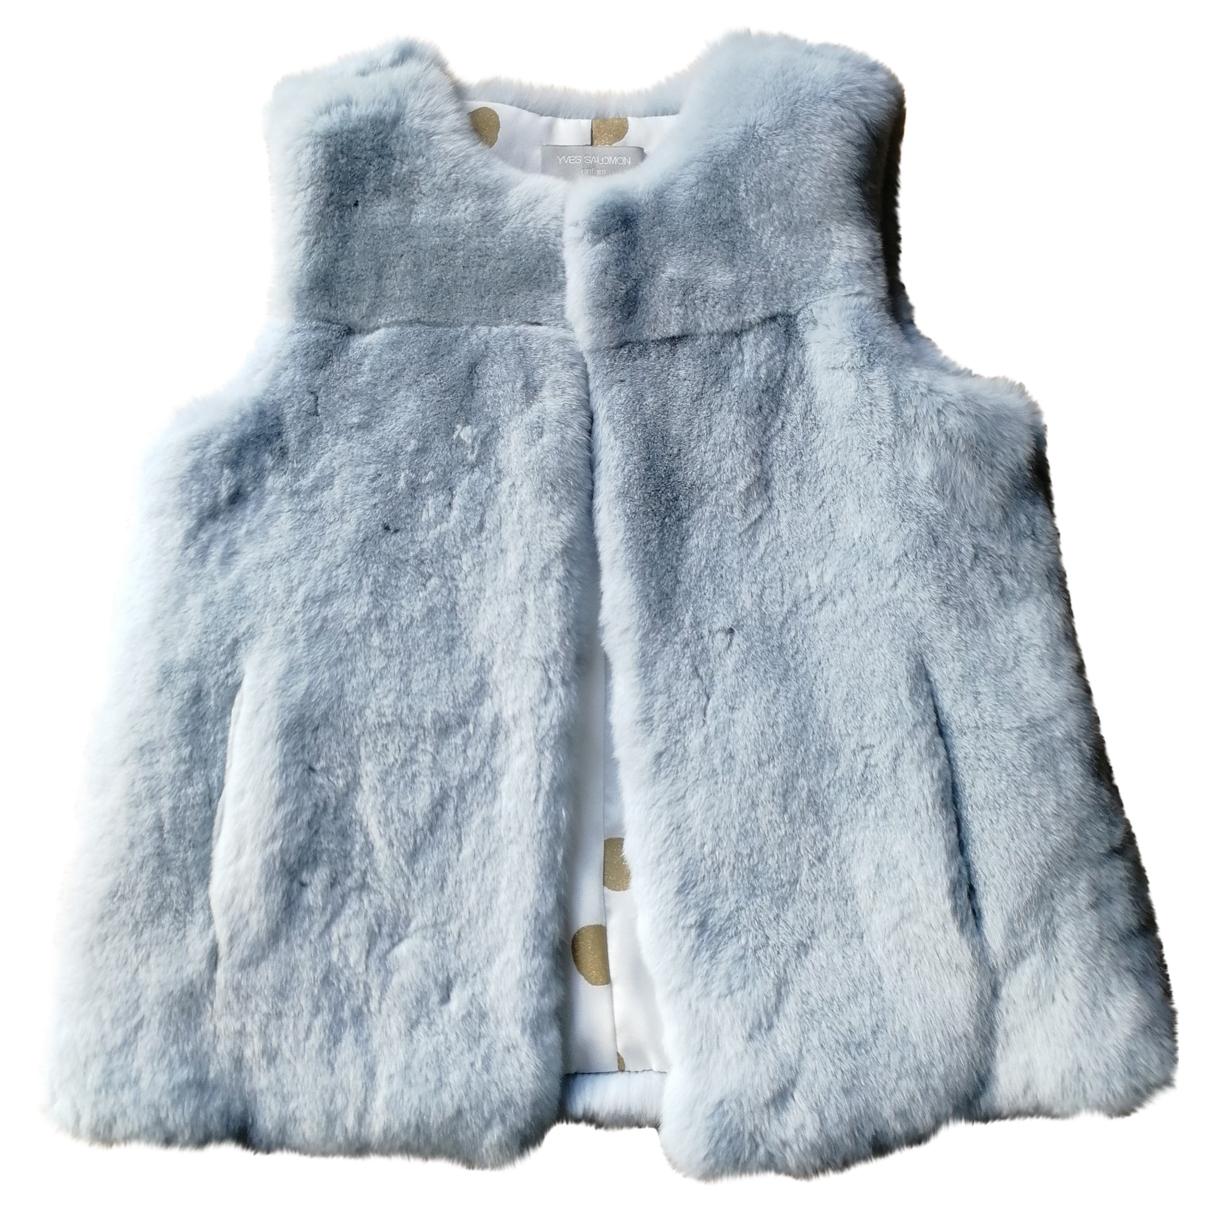 Yves Salomon \N Blue Rabbit jacket & coat for Kids 8 years - up to 128cm FR